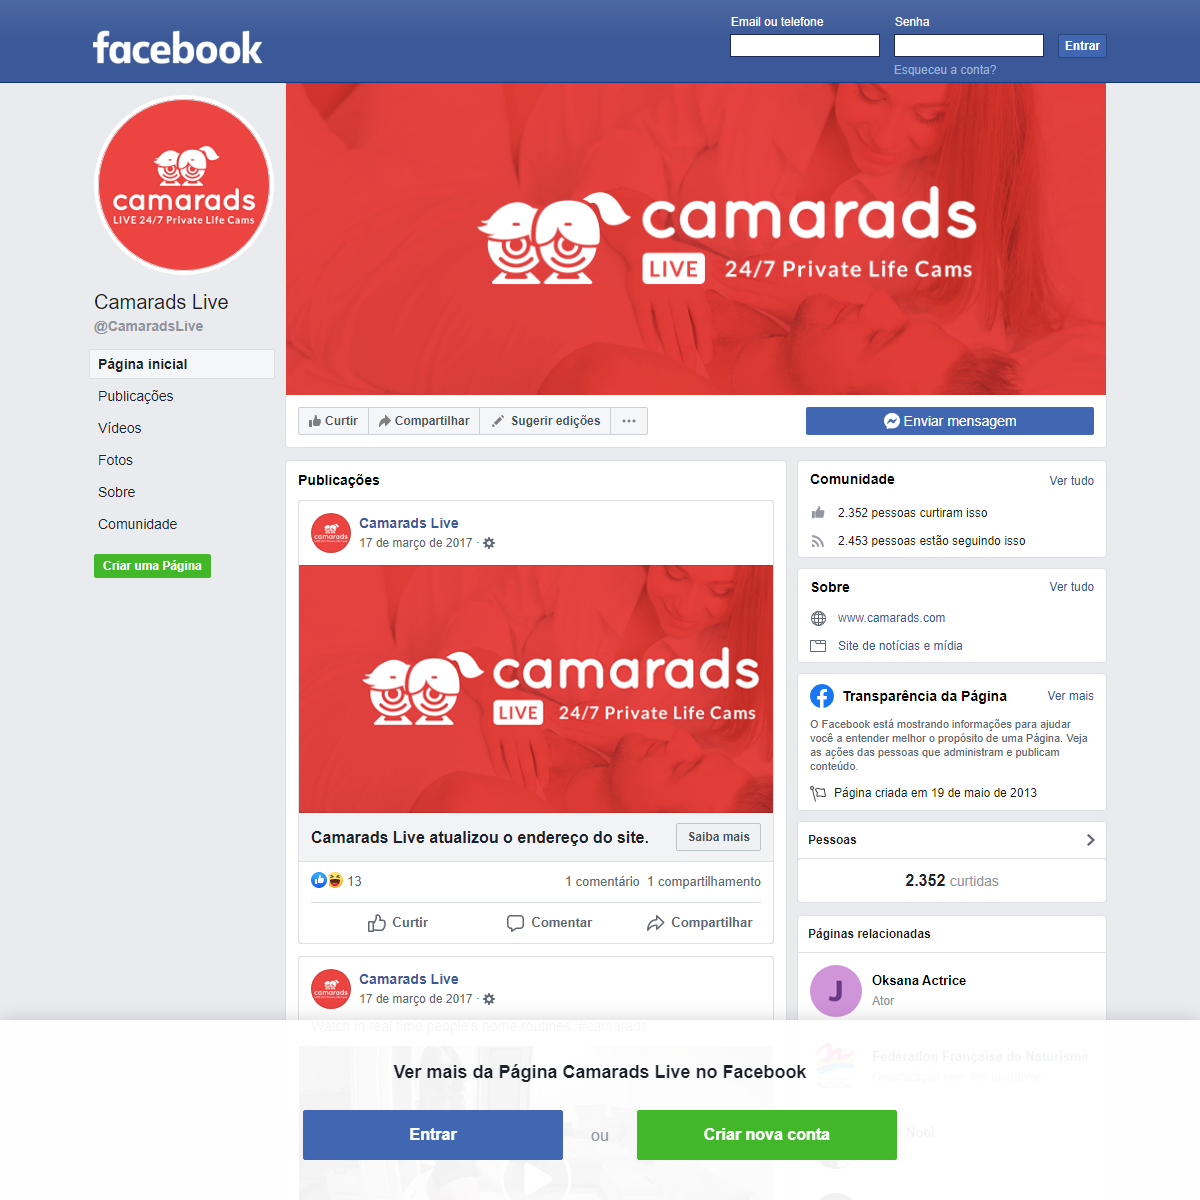 Camarads Live - Página inicial - Facebook